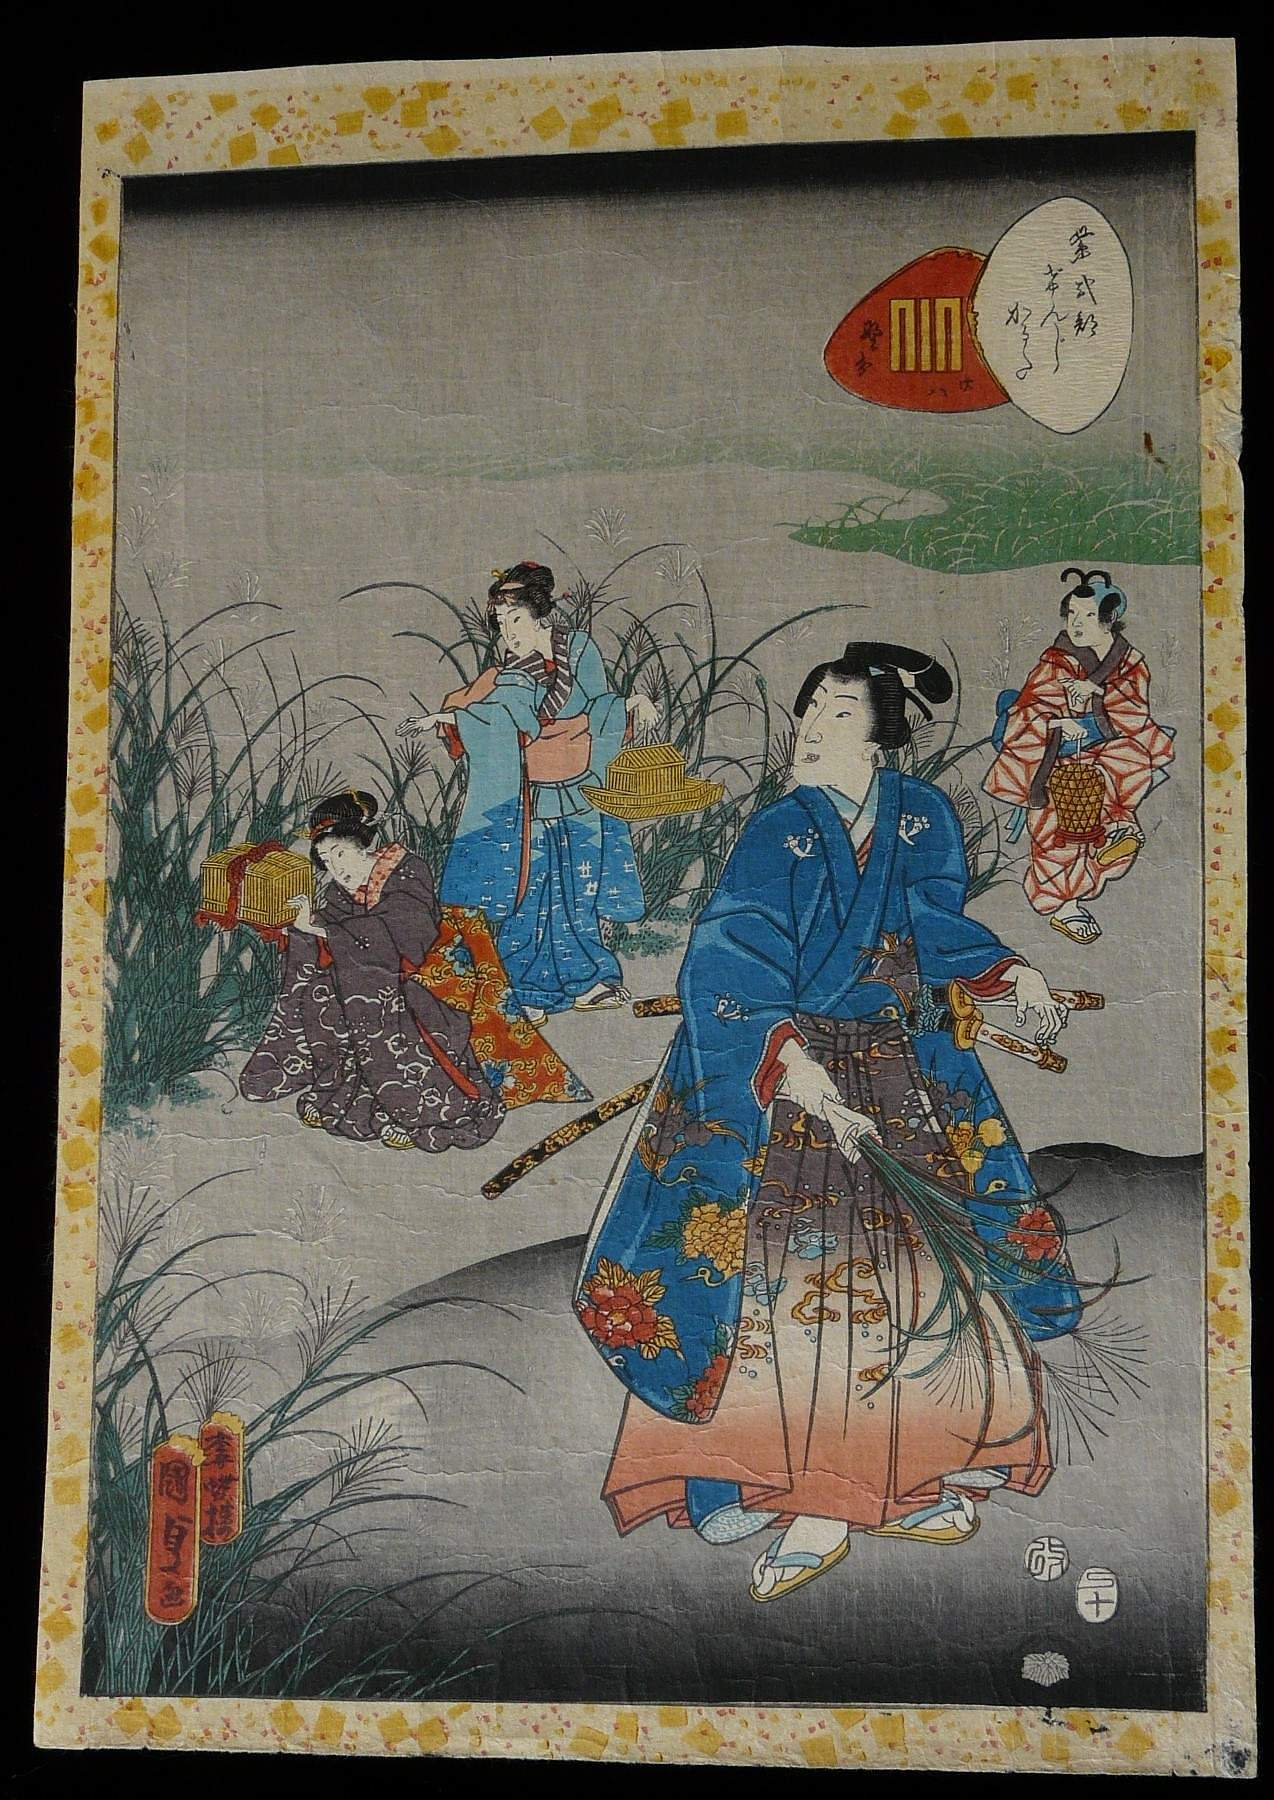 KUNISADA THE SECOND AKA BAIDO KUNIMASA: #P3194 A SCENE FROM THE VERY RARE SERIES MURASAKI SHIKIBU GENJI KARUTA - FIFTY-FOUR MODERN FEELINGS DATED 1857